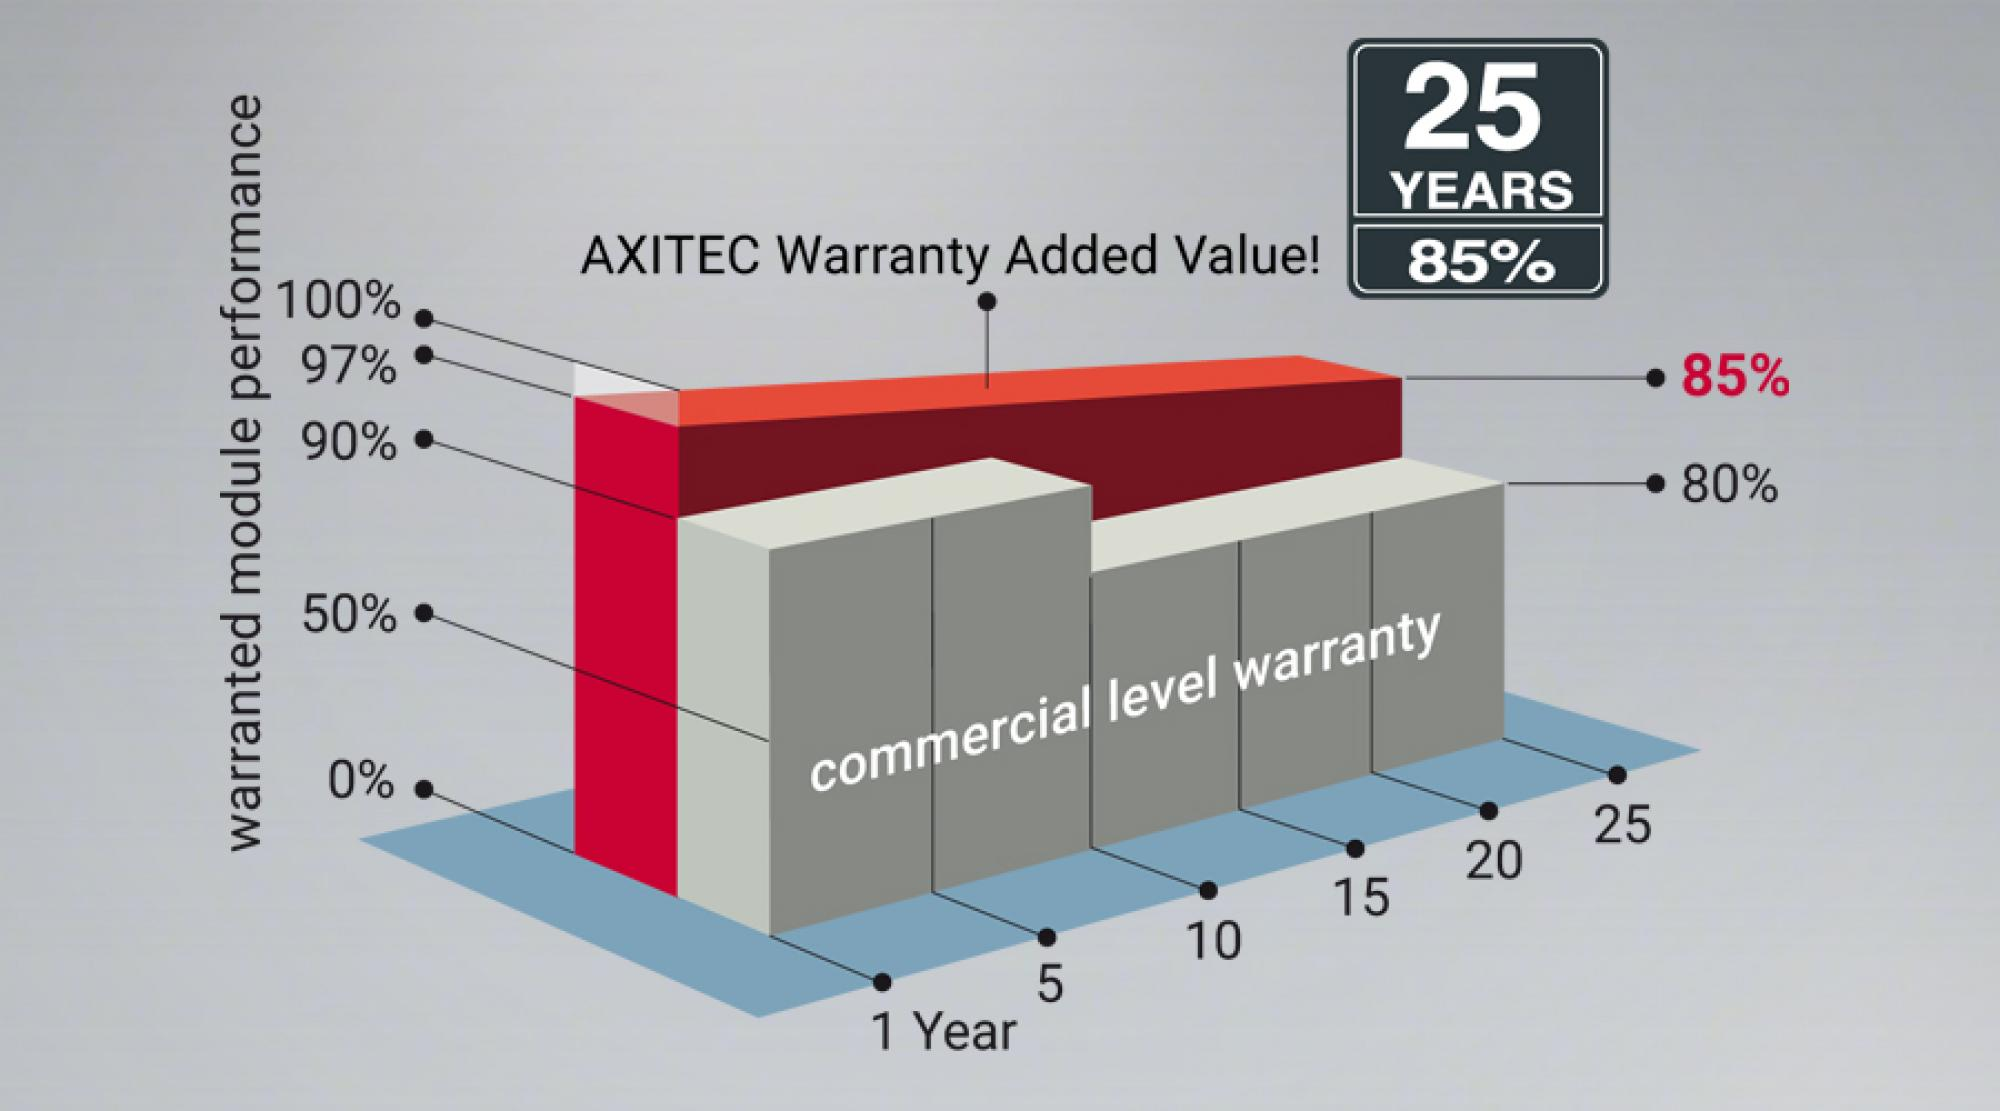 AXITEC'S linear performance guarantee